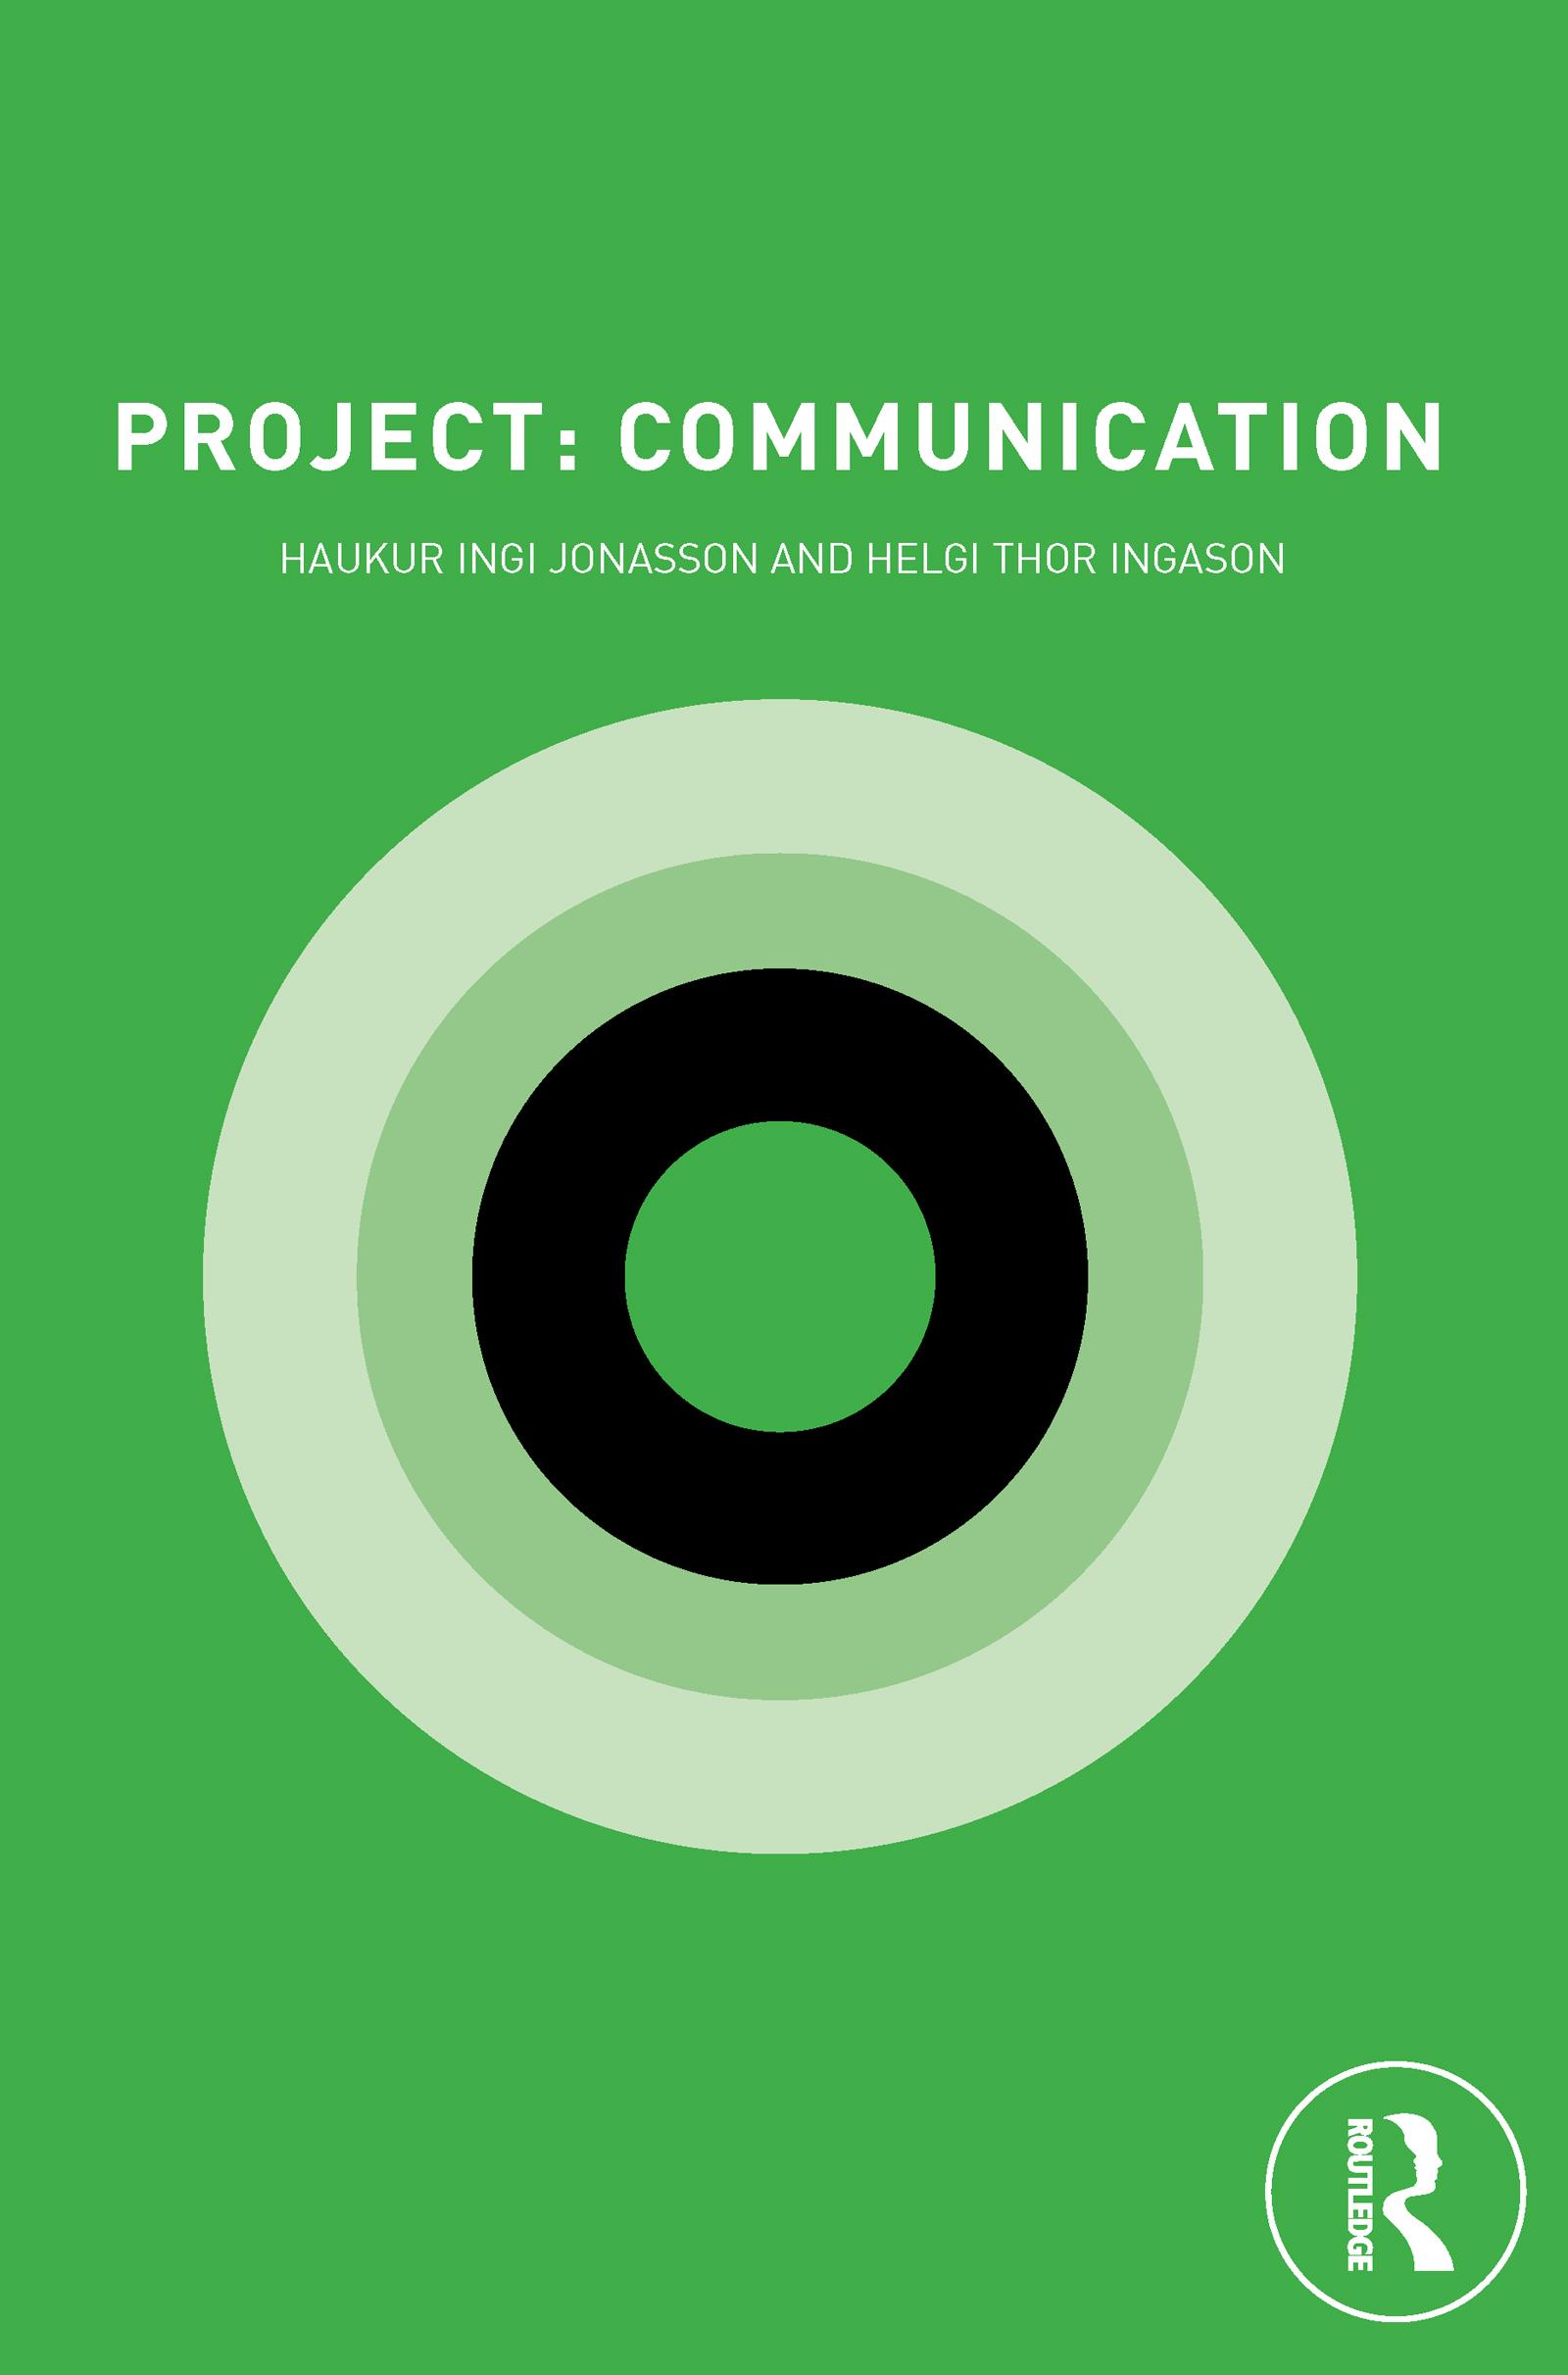 Download Ebook Project: Communication by Haukur Ingi Jonasson Pdf